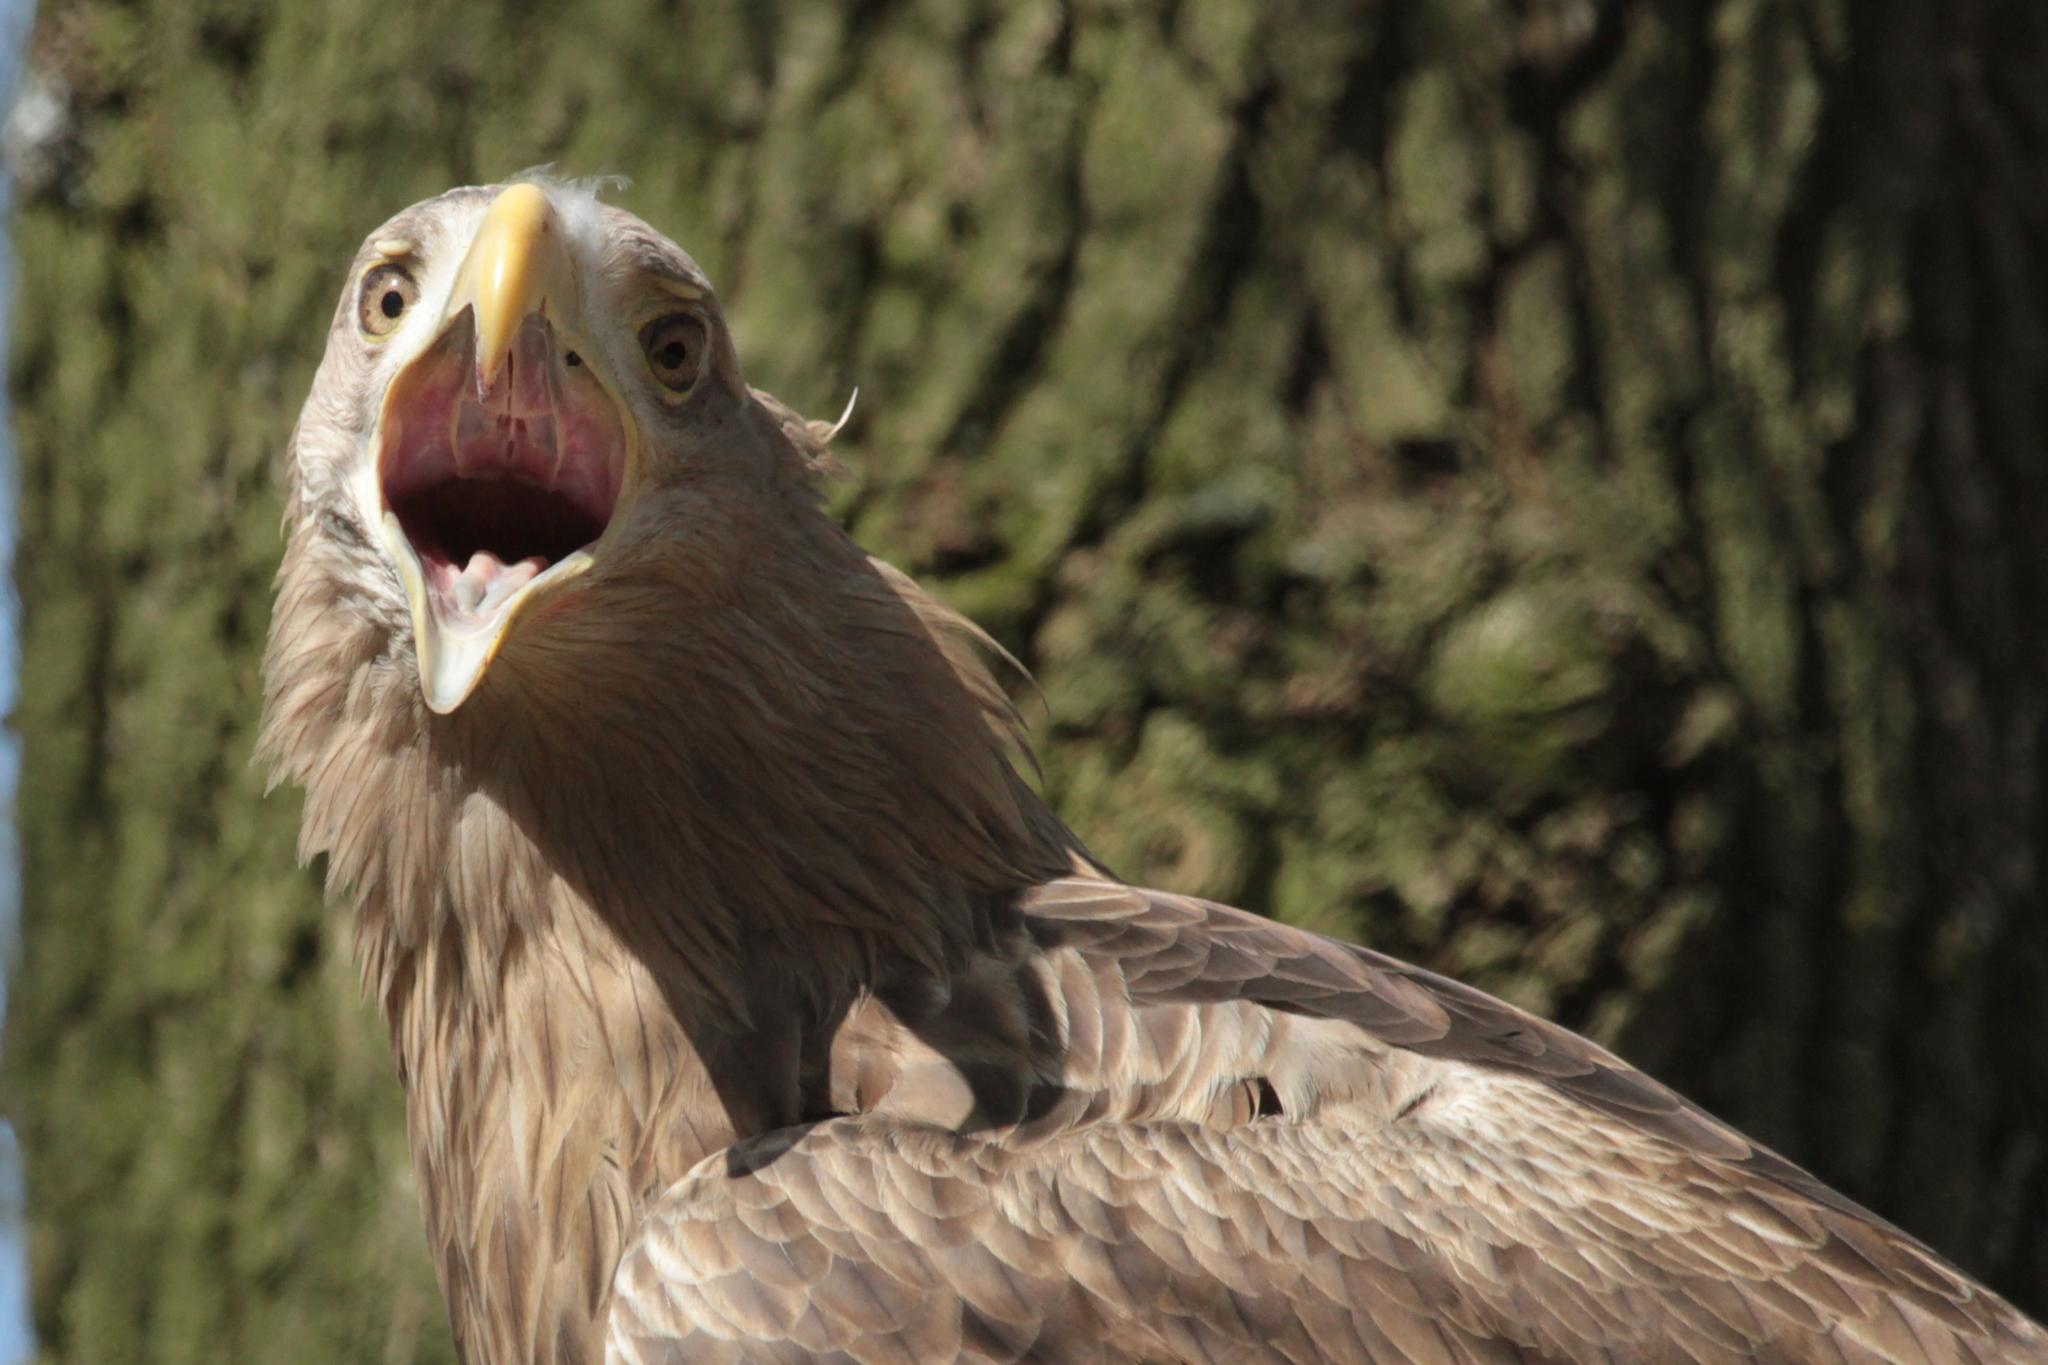 Sea eagle by henkschneider